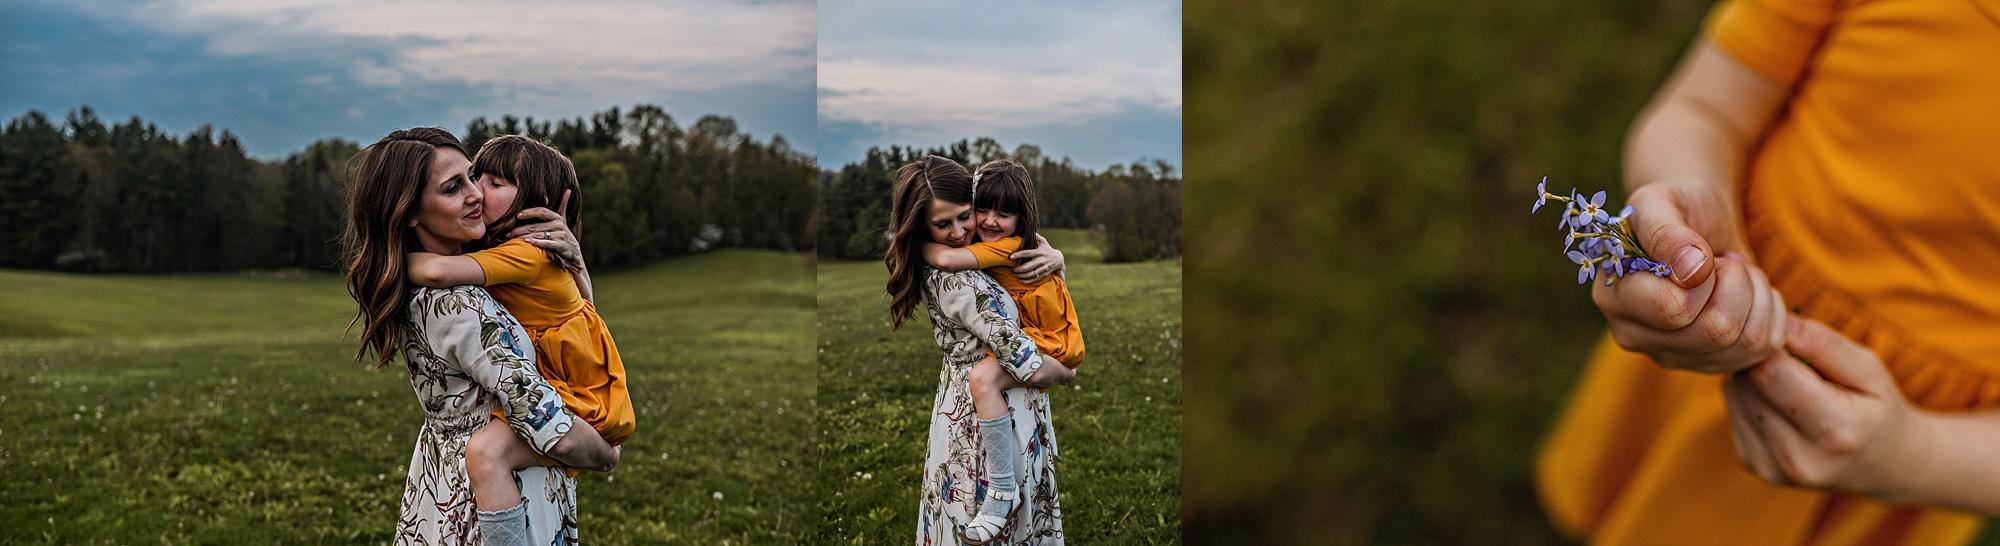 lauren-grayson-akron-ohio-family-photographer-molly_0028.jpg